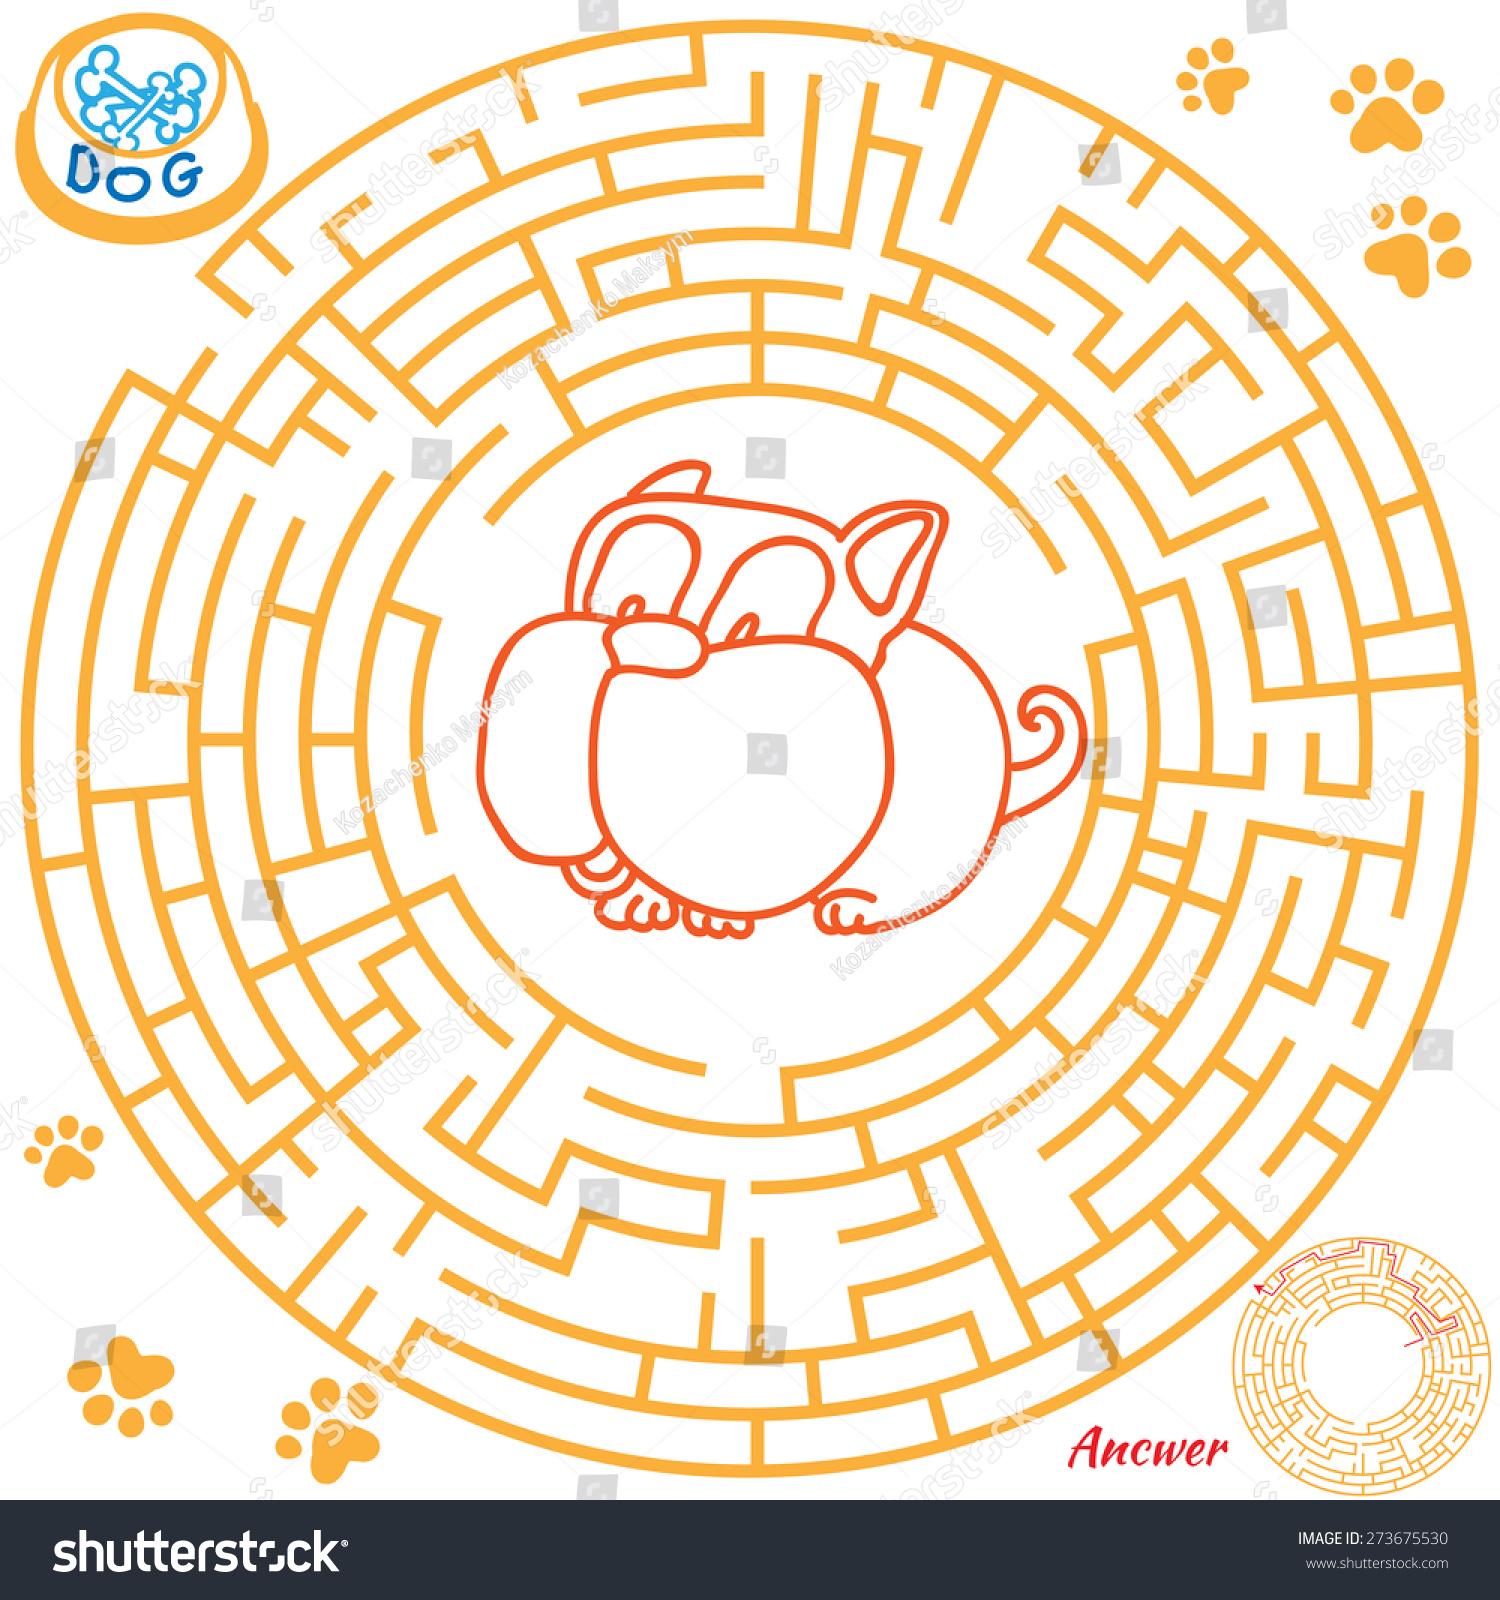 Funny Labyrinth Help Dog Find Bone Stock Illustration 273675530 ...